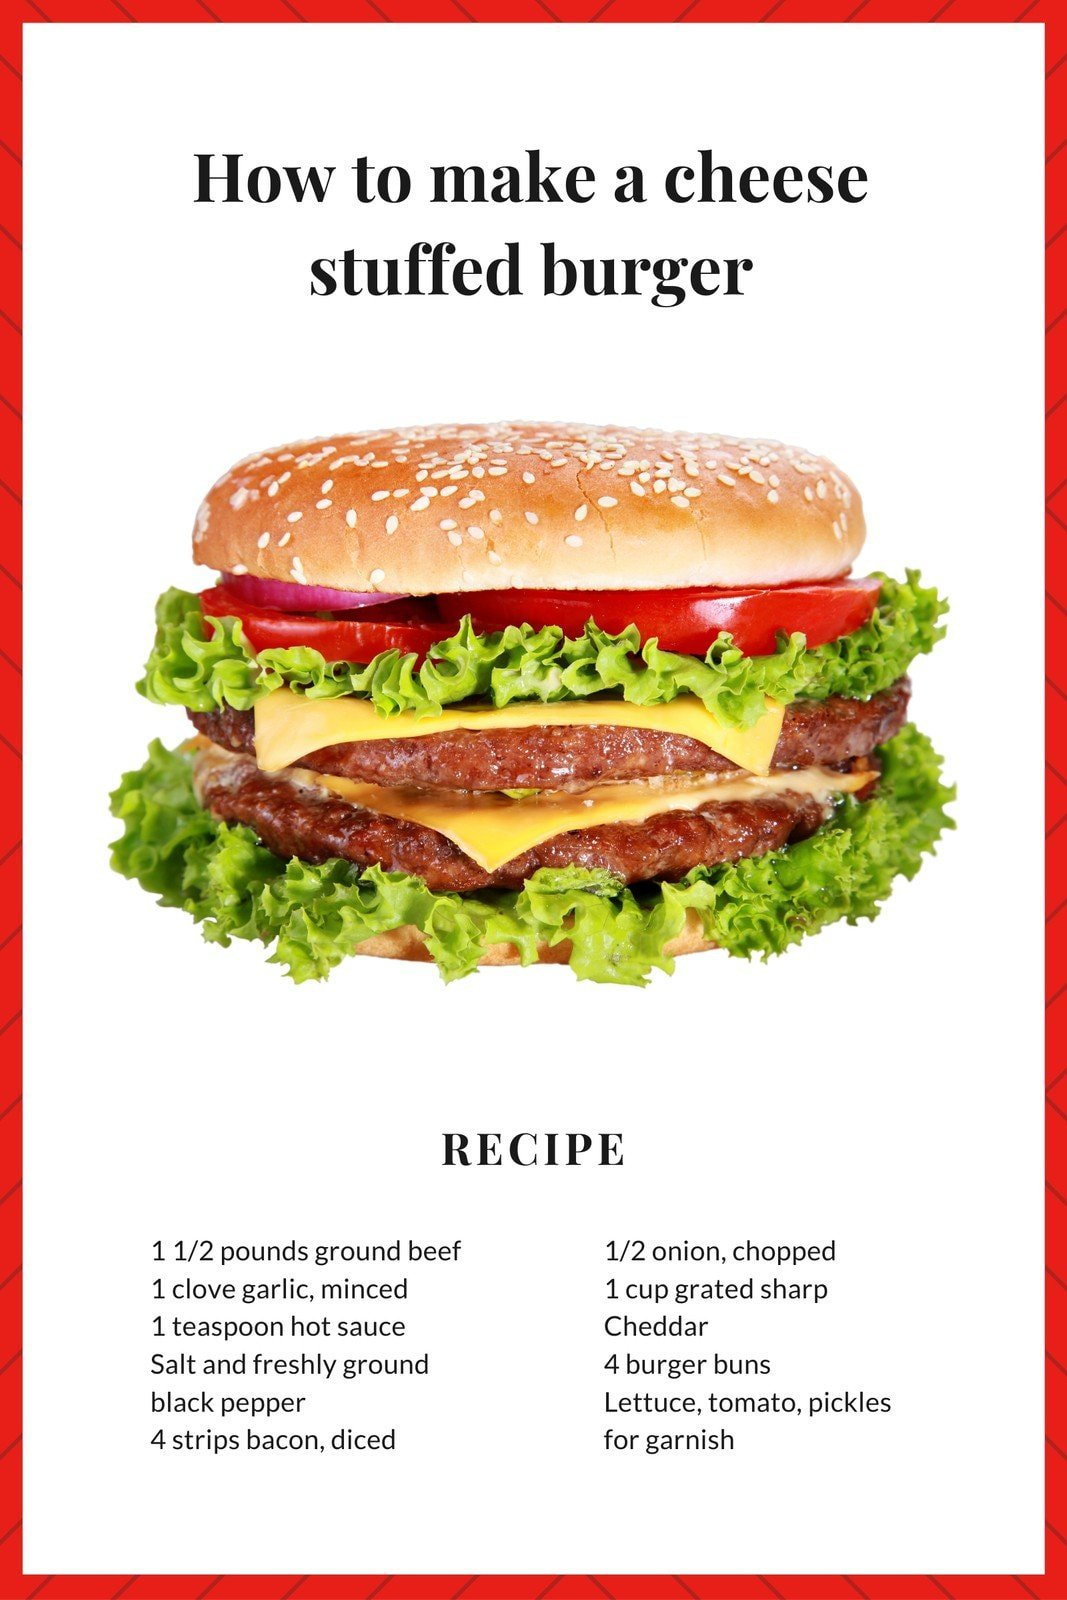 Red Burger Recipe Pinterest Graphic